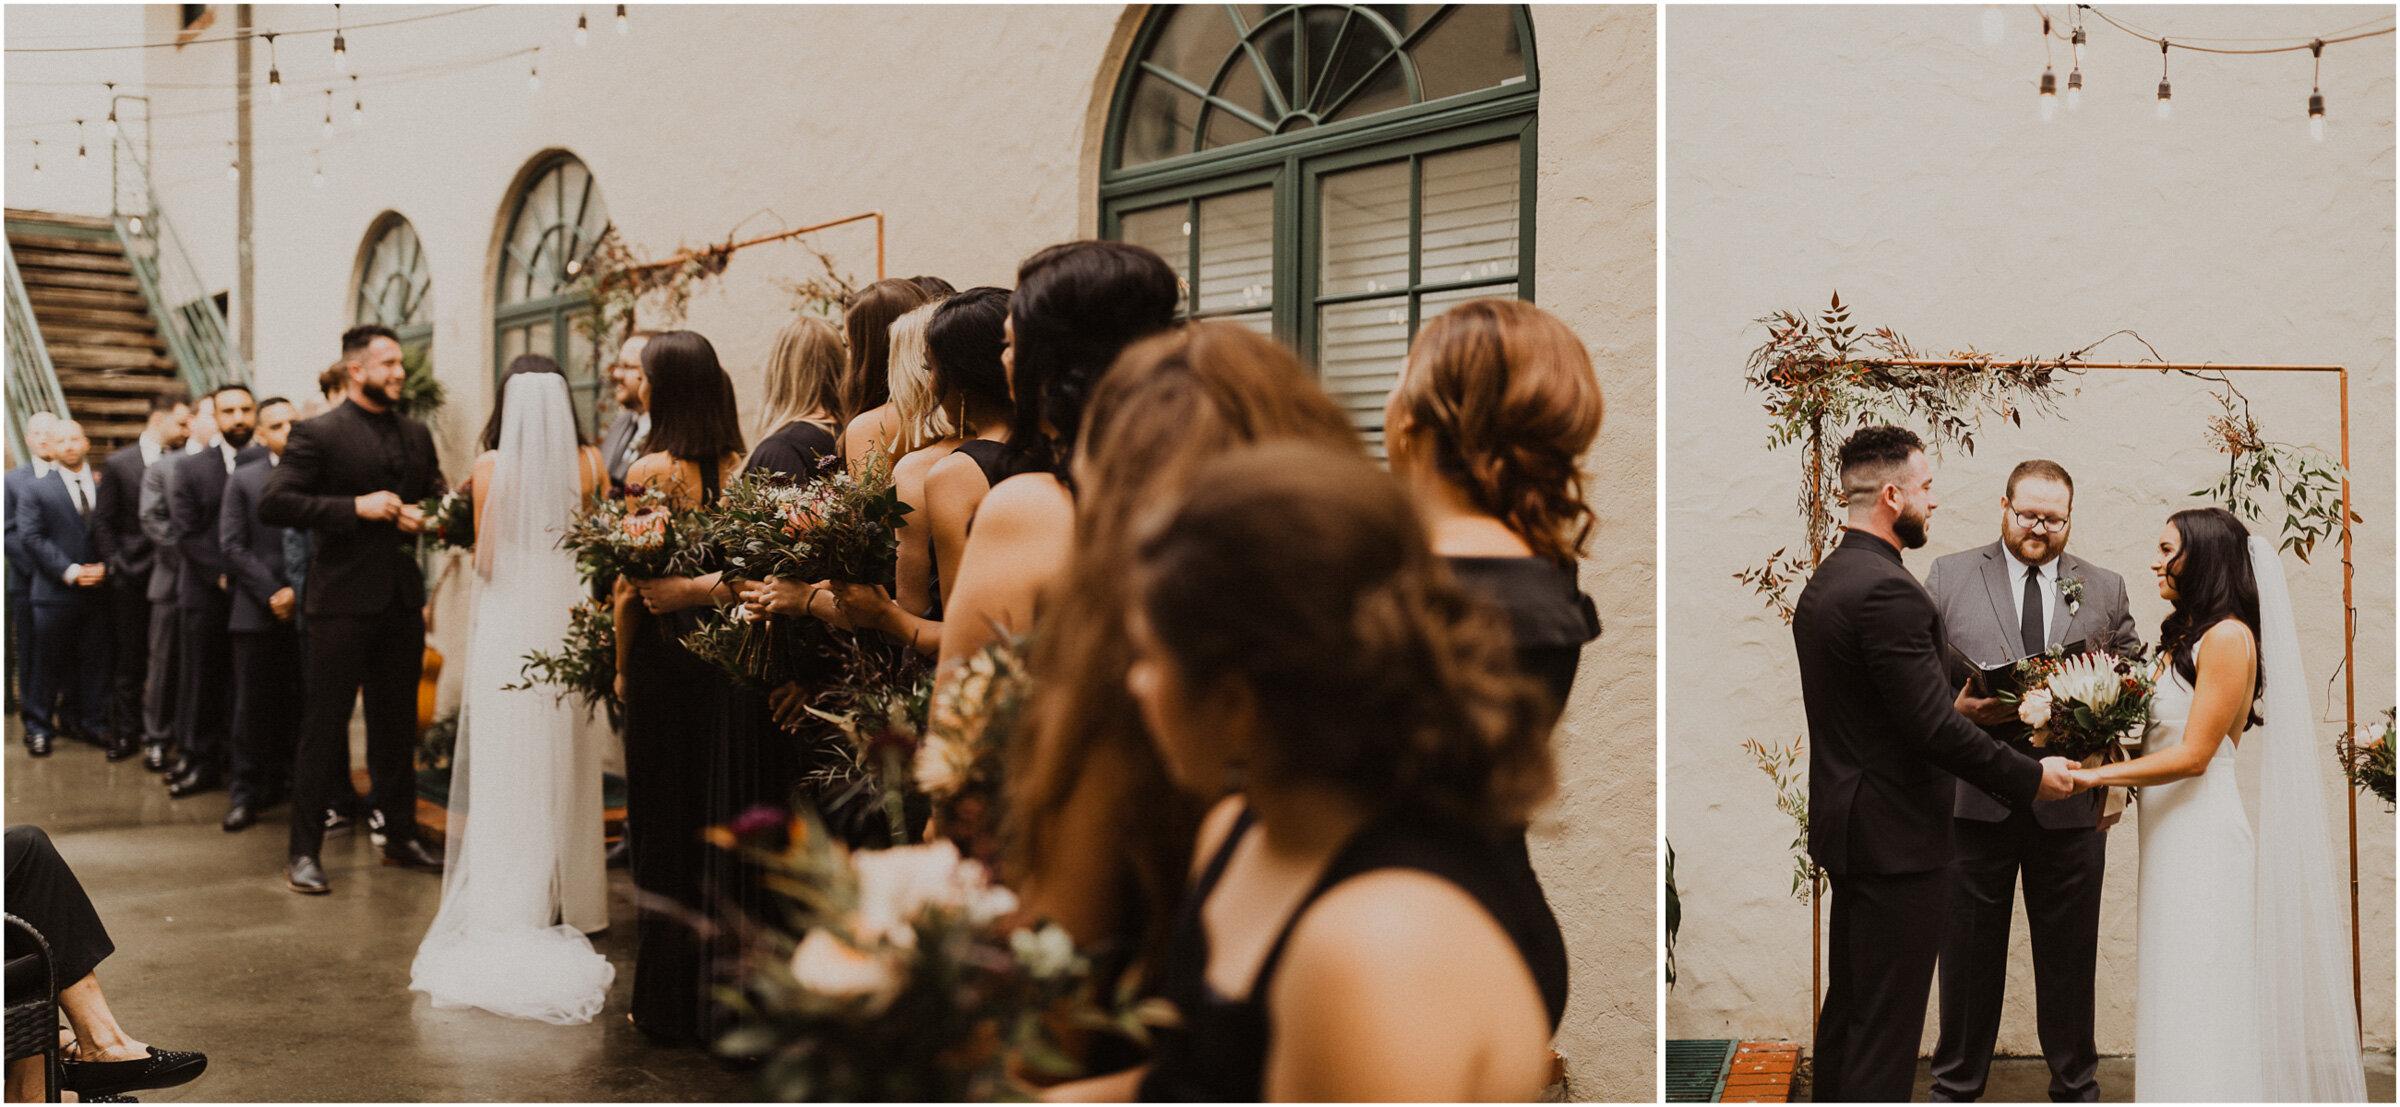 alyssa barletter photography la villa kansas city patio wedding sarah seven wedding dress-9.jpg